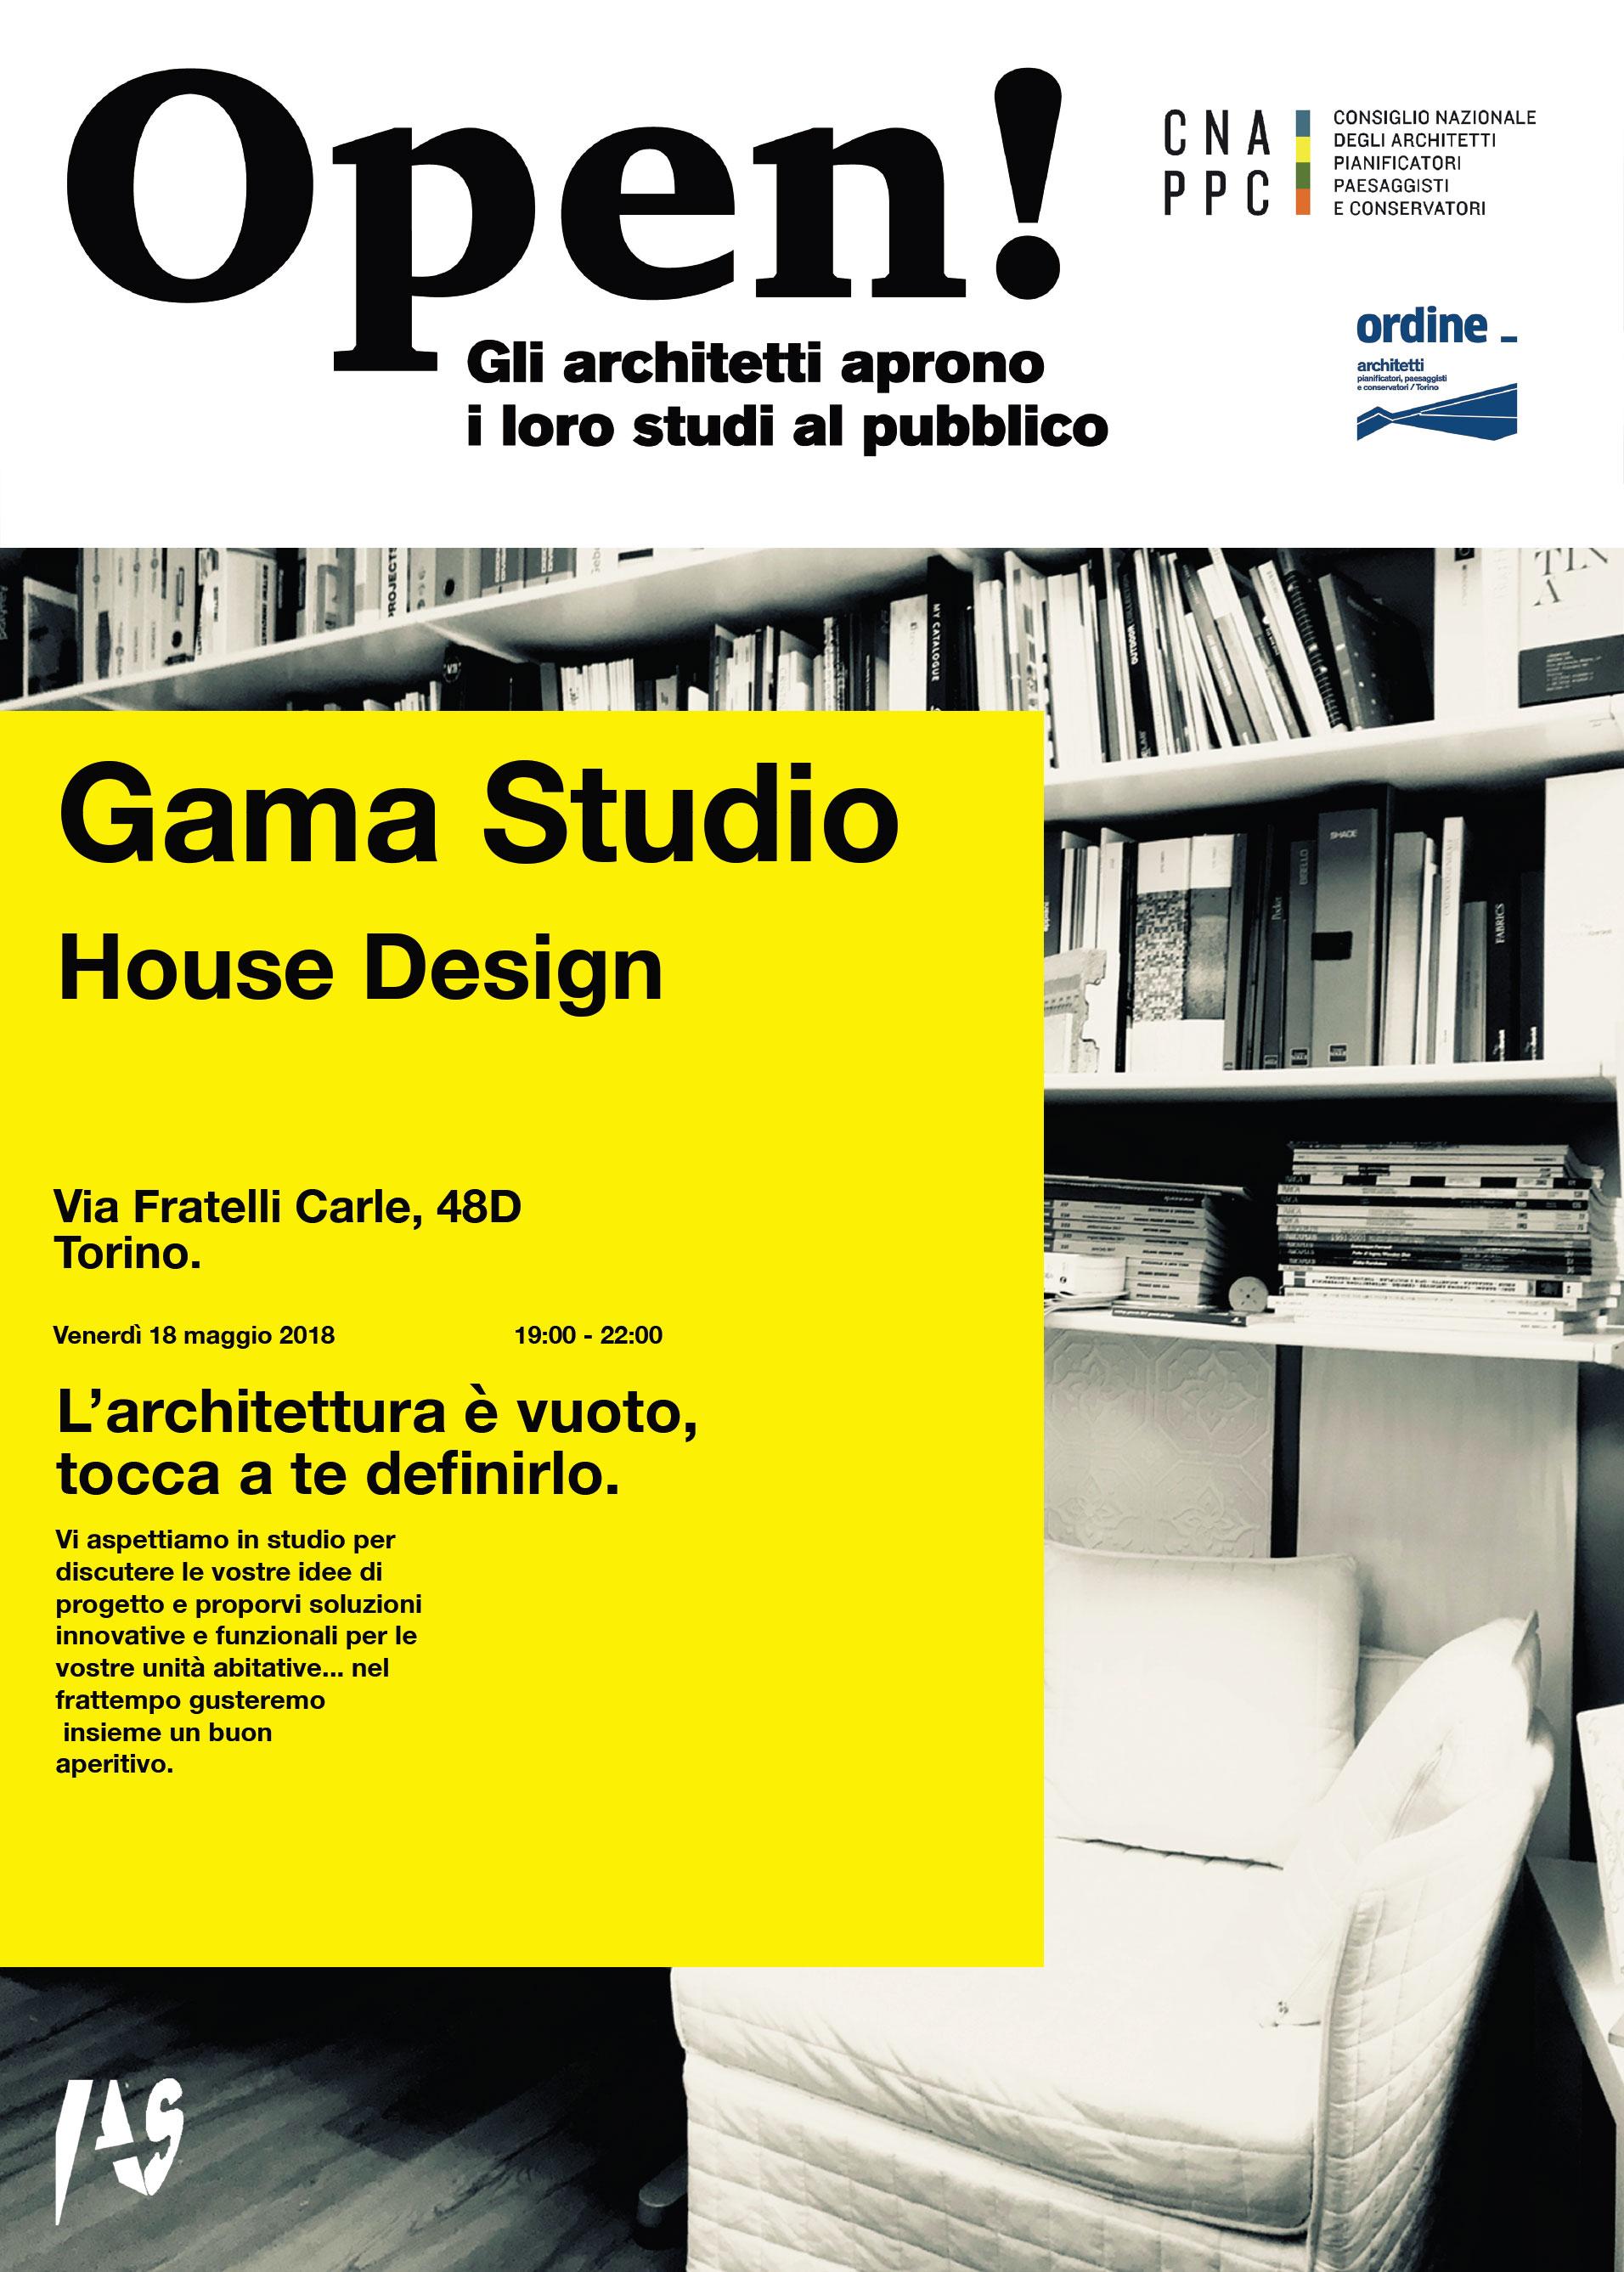 Fotografia Gama Studio